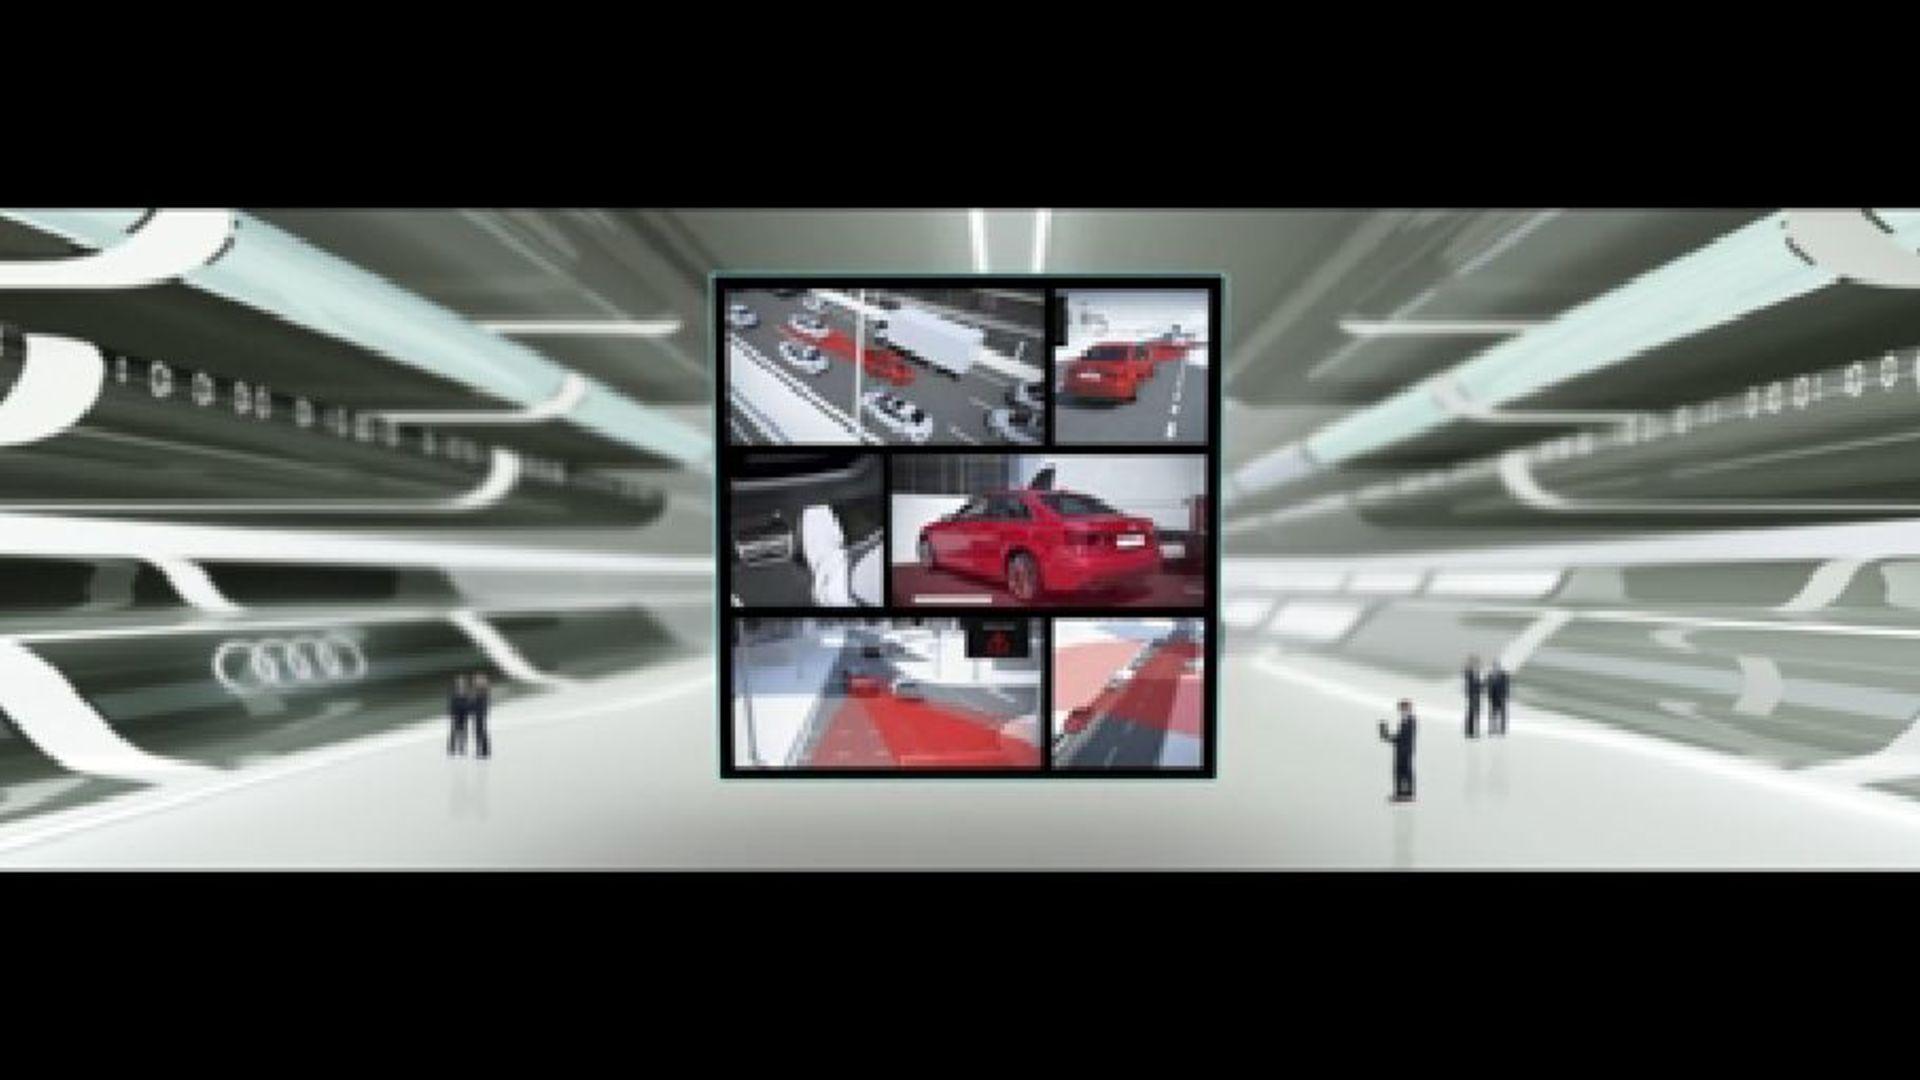 IAA Audi Eröffnungsfilm